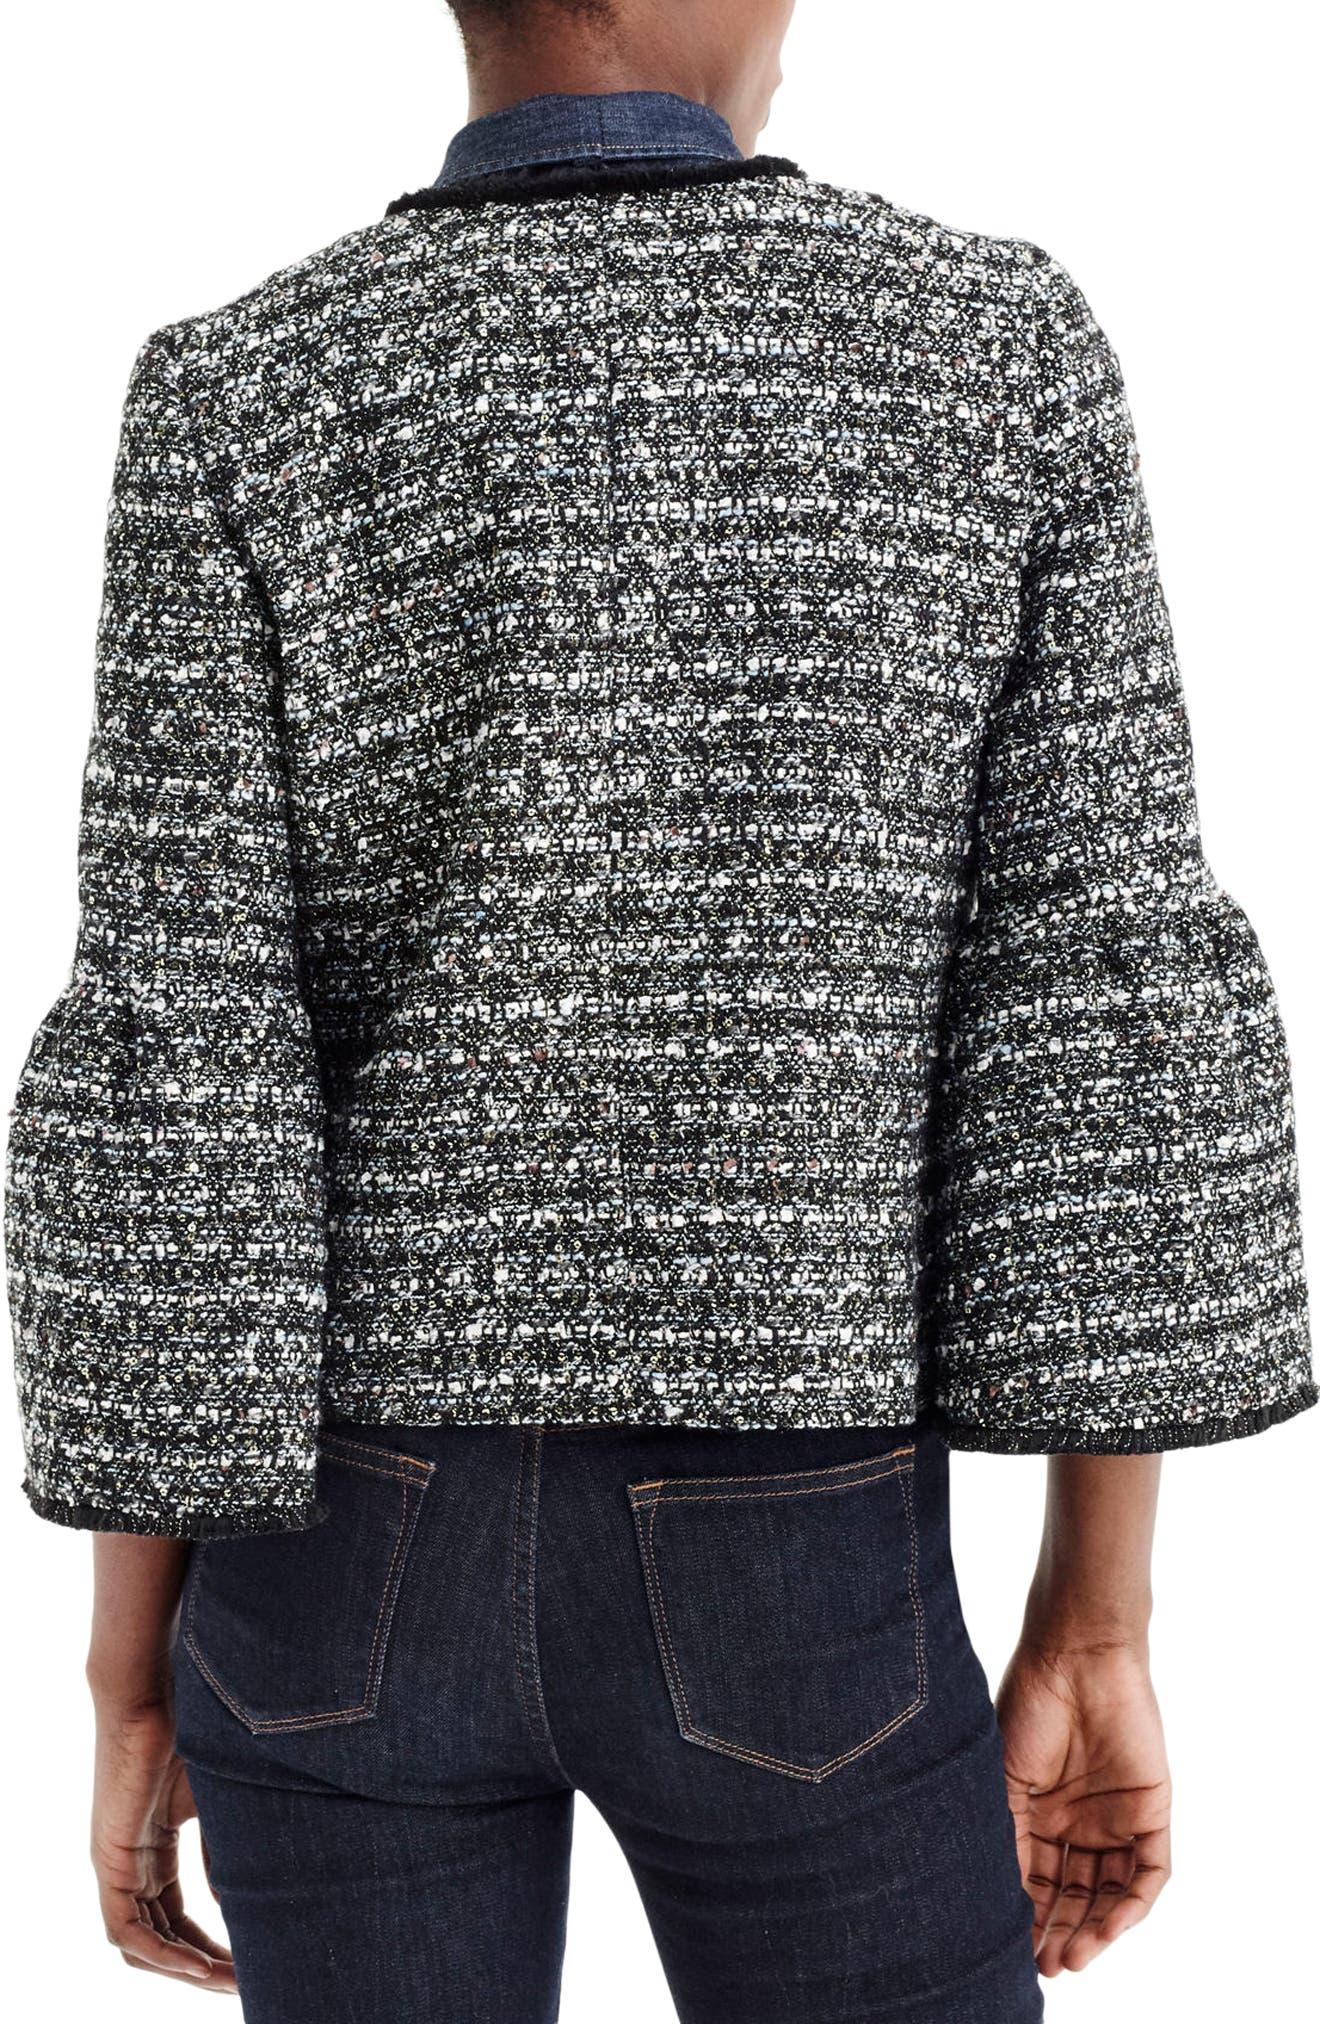 Belle Sequin Tweed Jacket,                             Alternate thumbnail 2, color,                             009